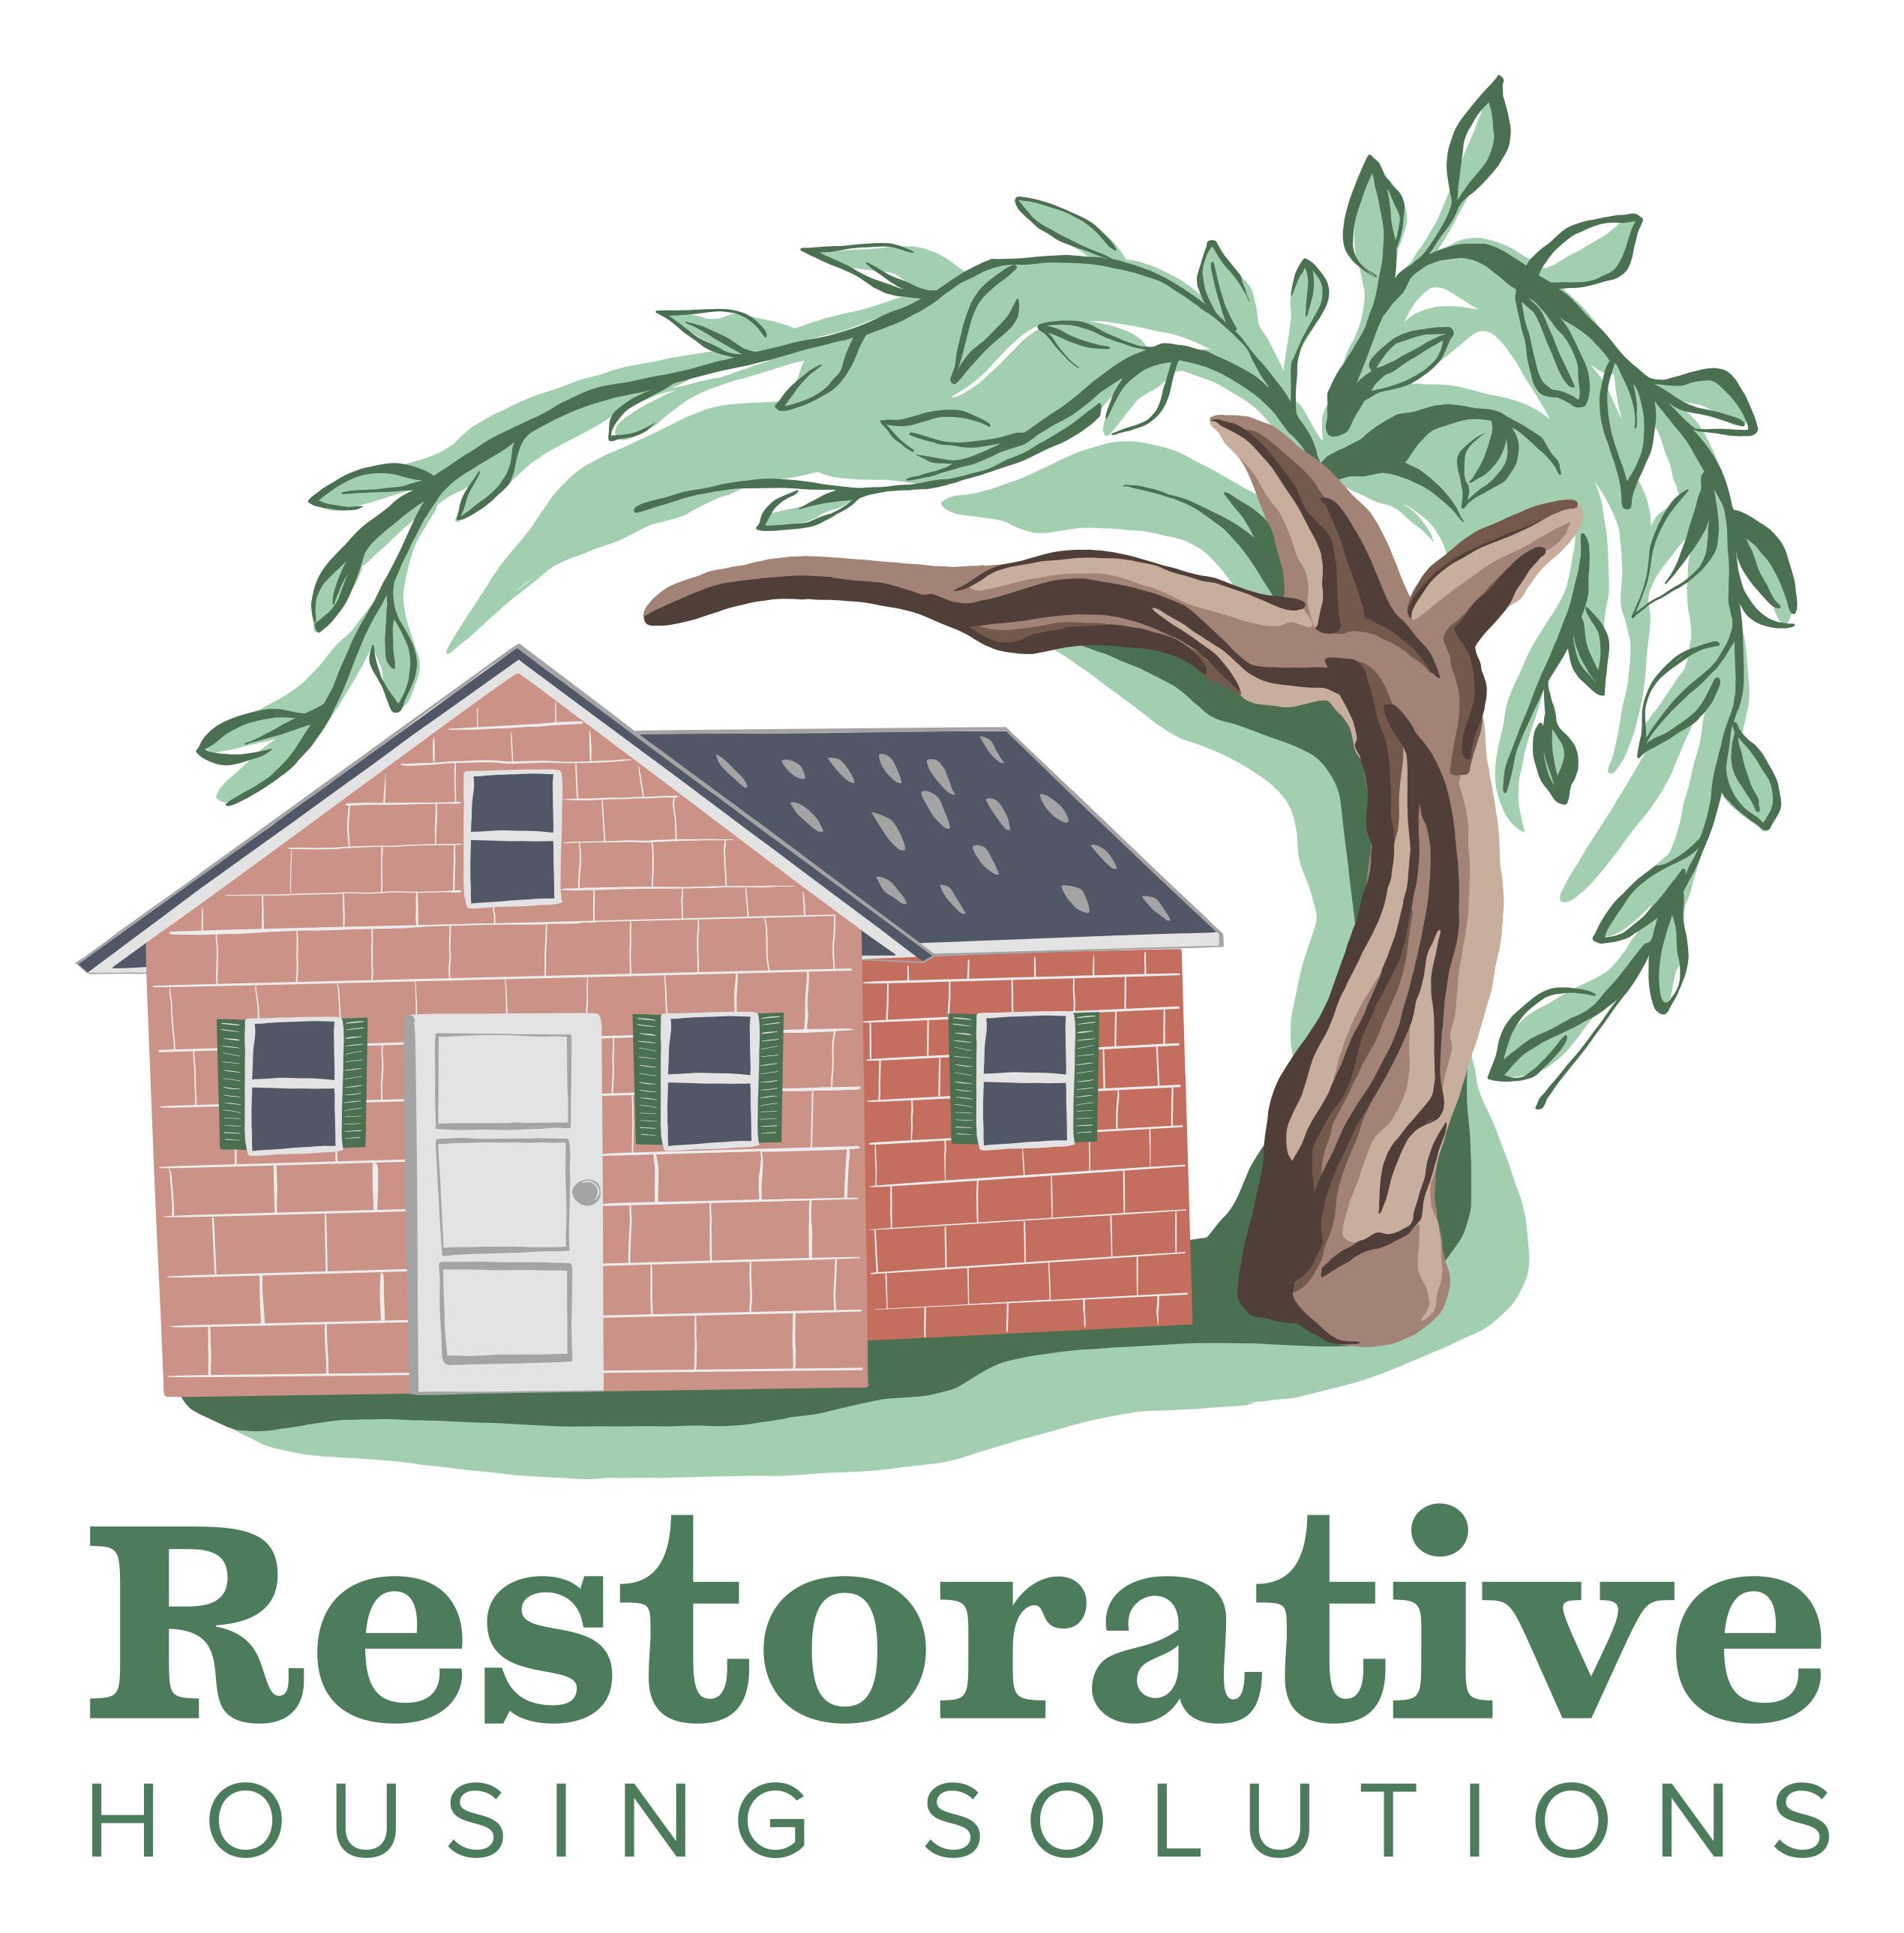 Restorative Housing Solutions